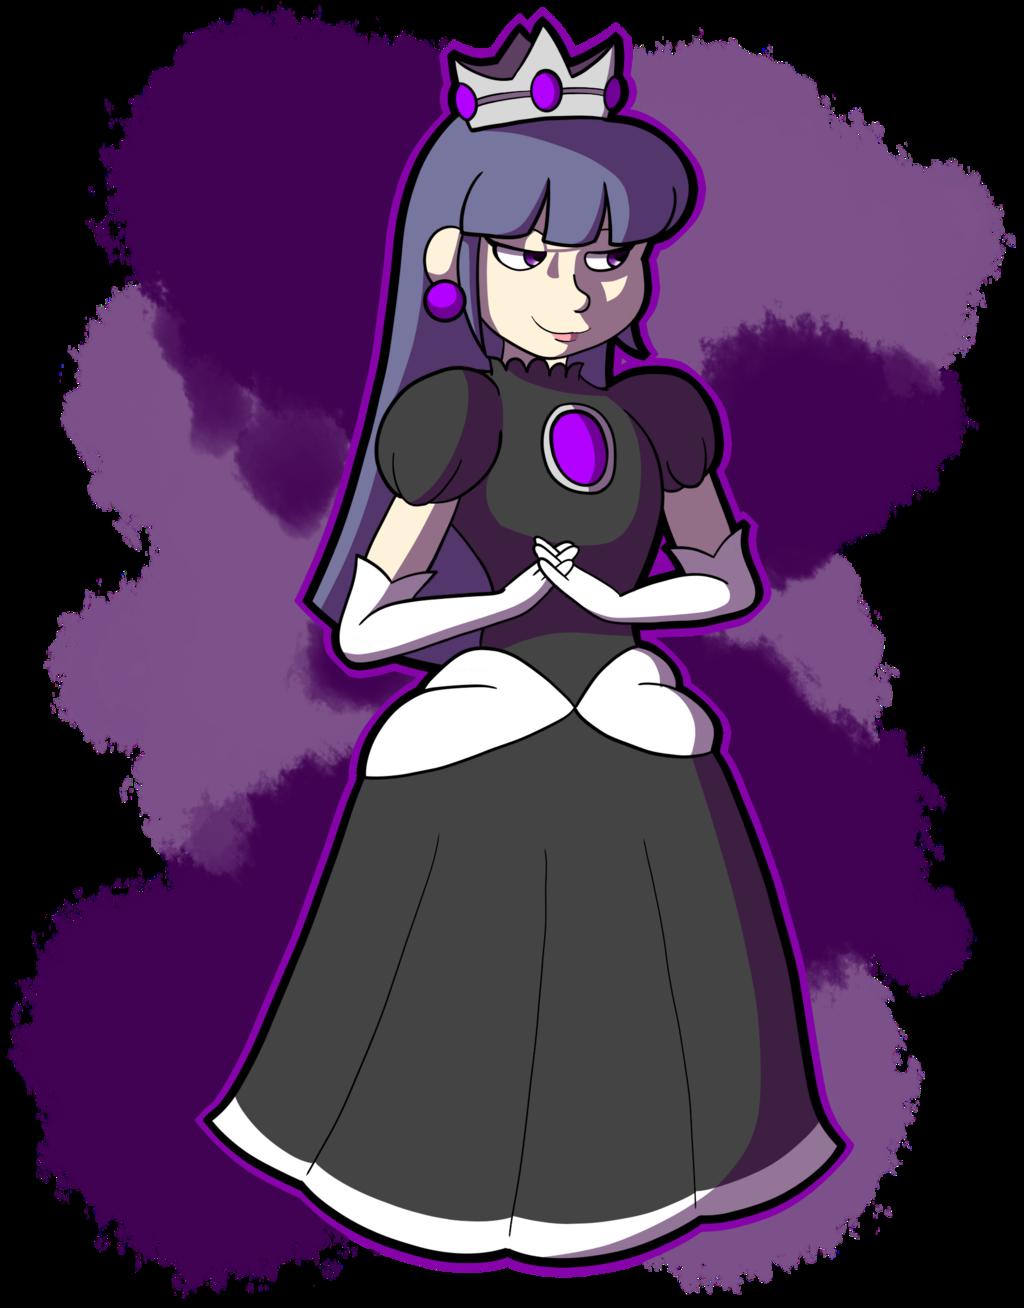 Princess Yuma